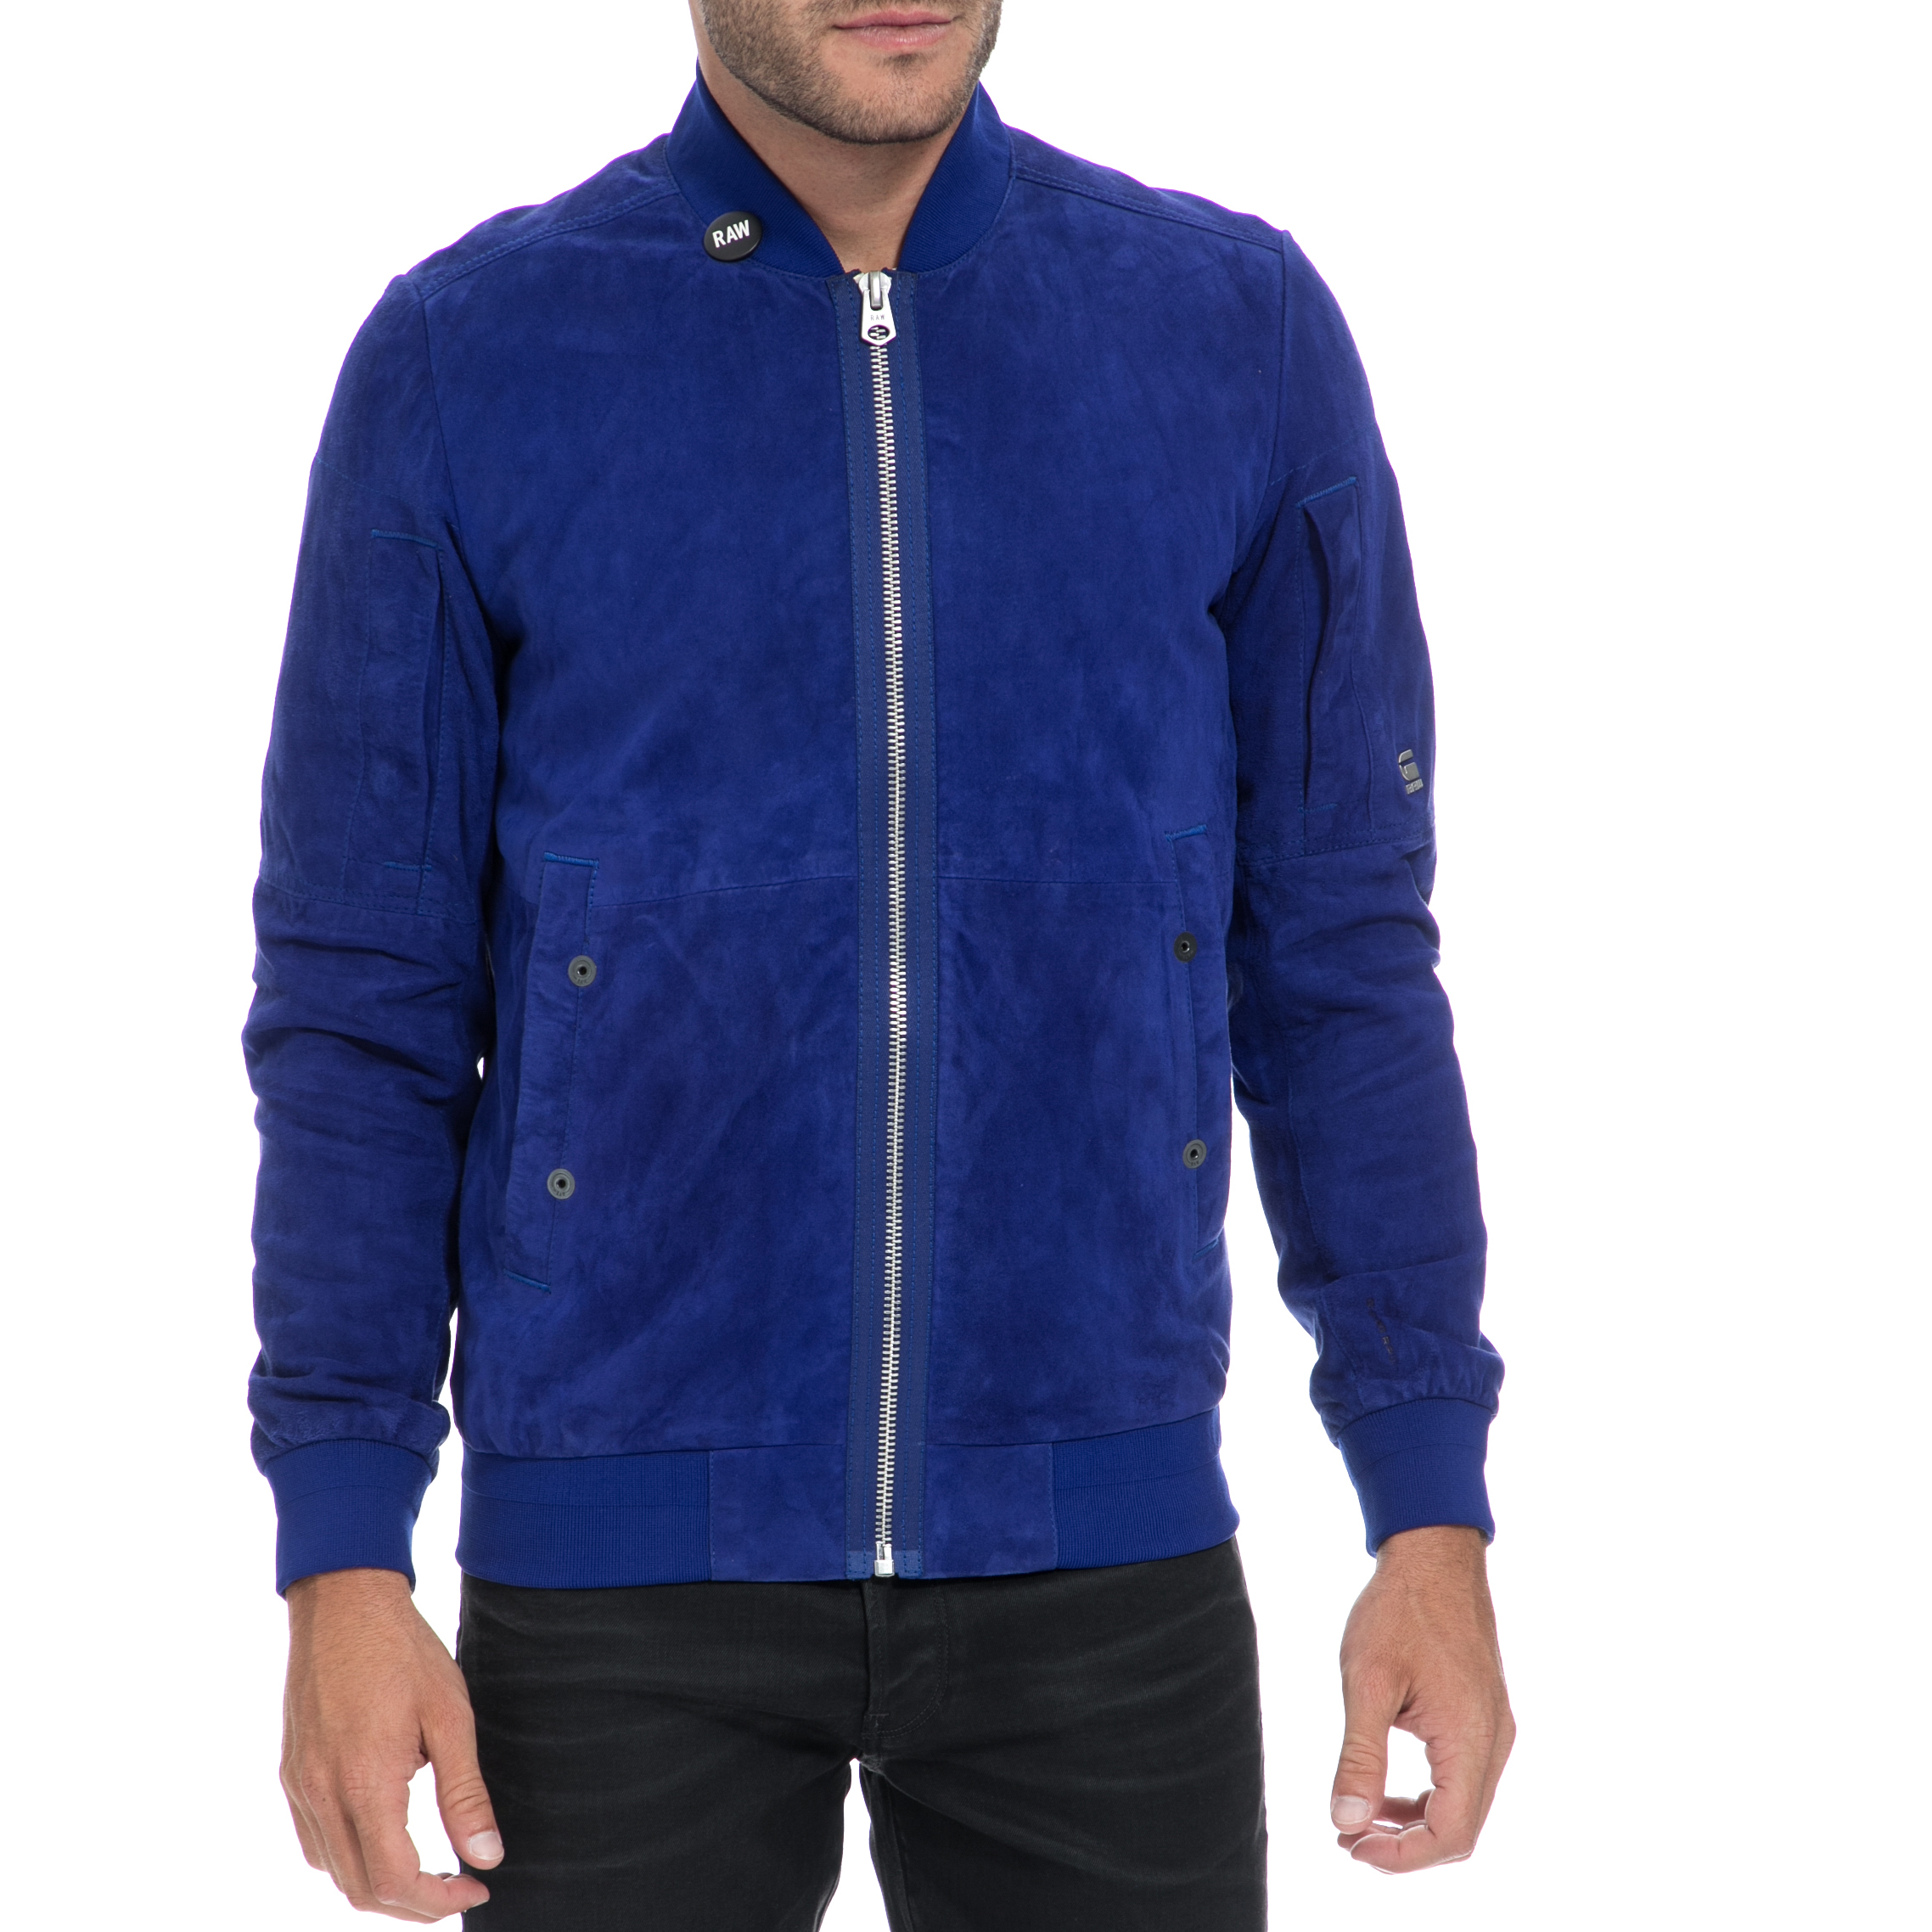 G-STAR RAW - Αντρικό τζάκετ G-STAR RAW μπλε ανδρικά ρούχα πανωφόρια τζάκετς